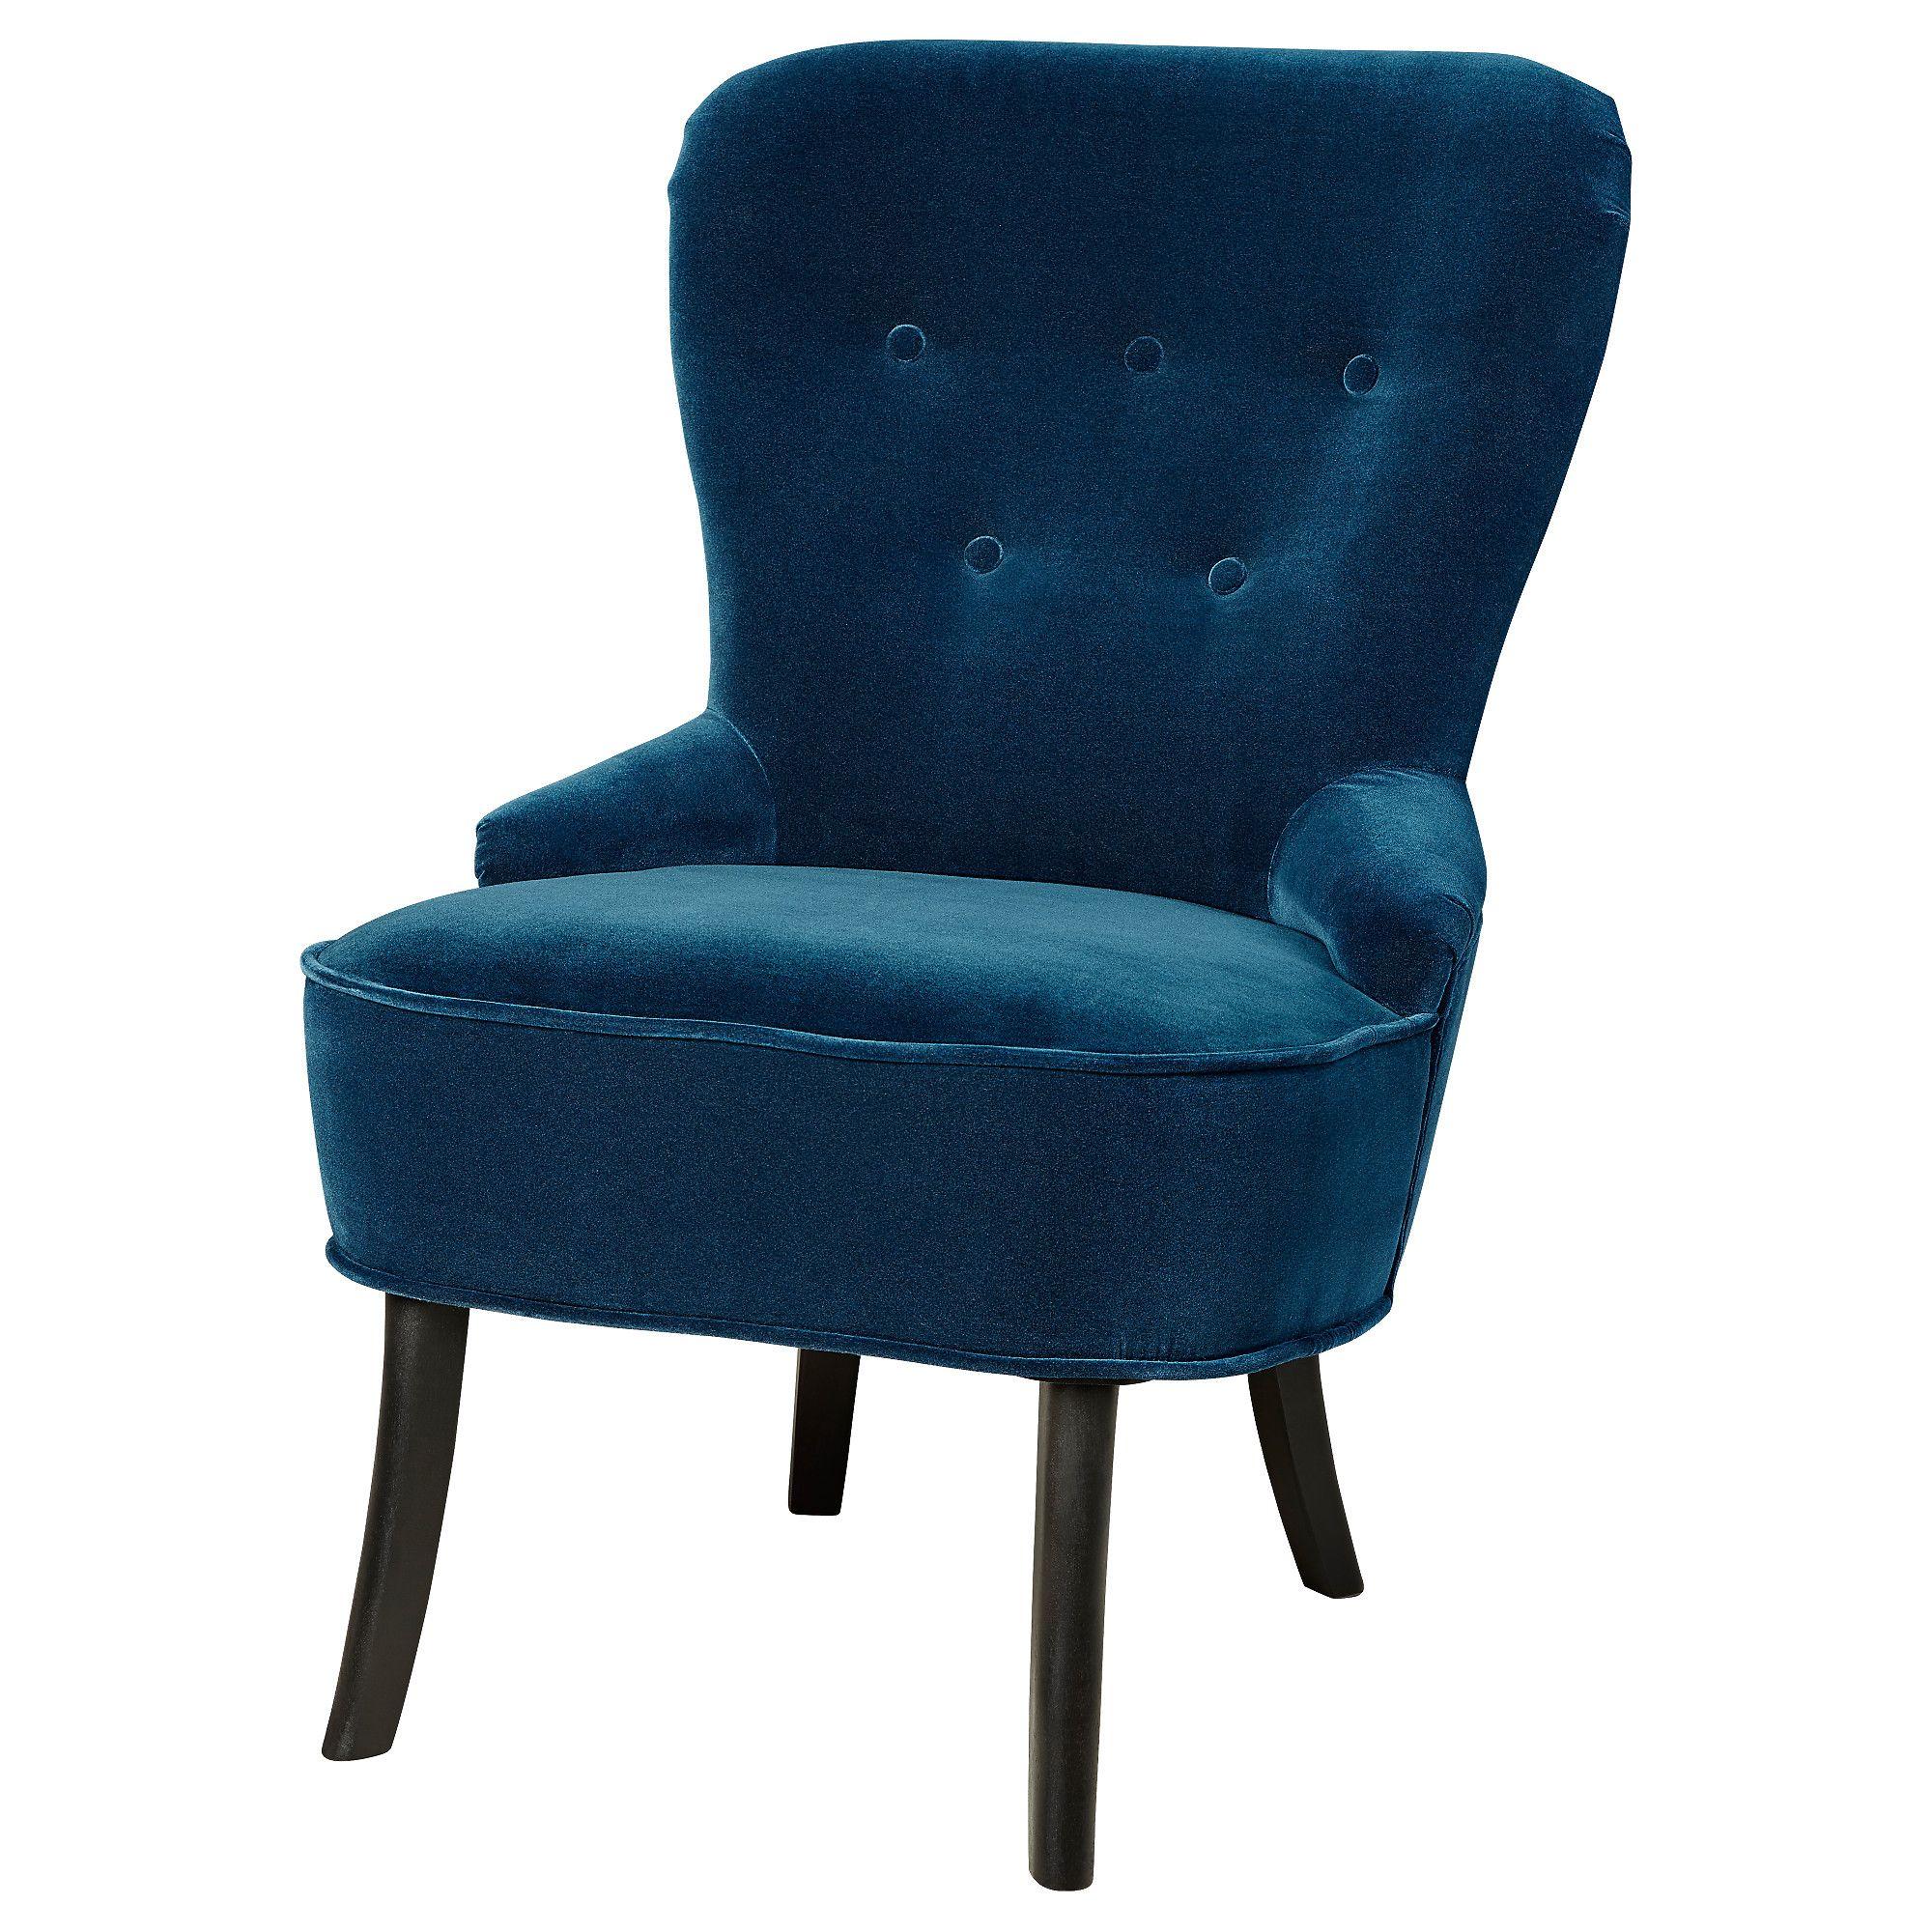 Sedia Poltrona Ikea.Remsta Poltrona Djuparp Verde Blu Scuro Blu Verde New